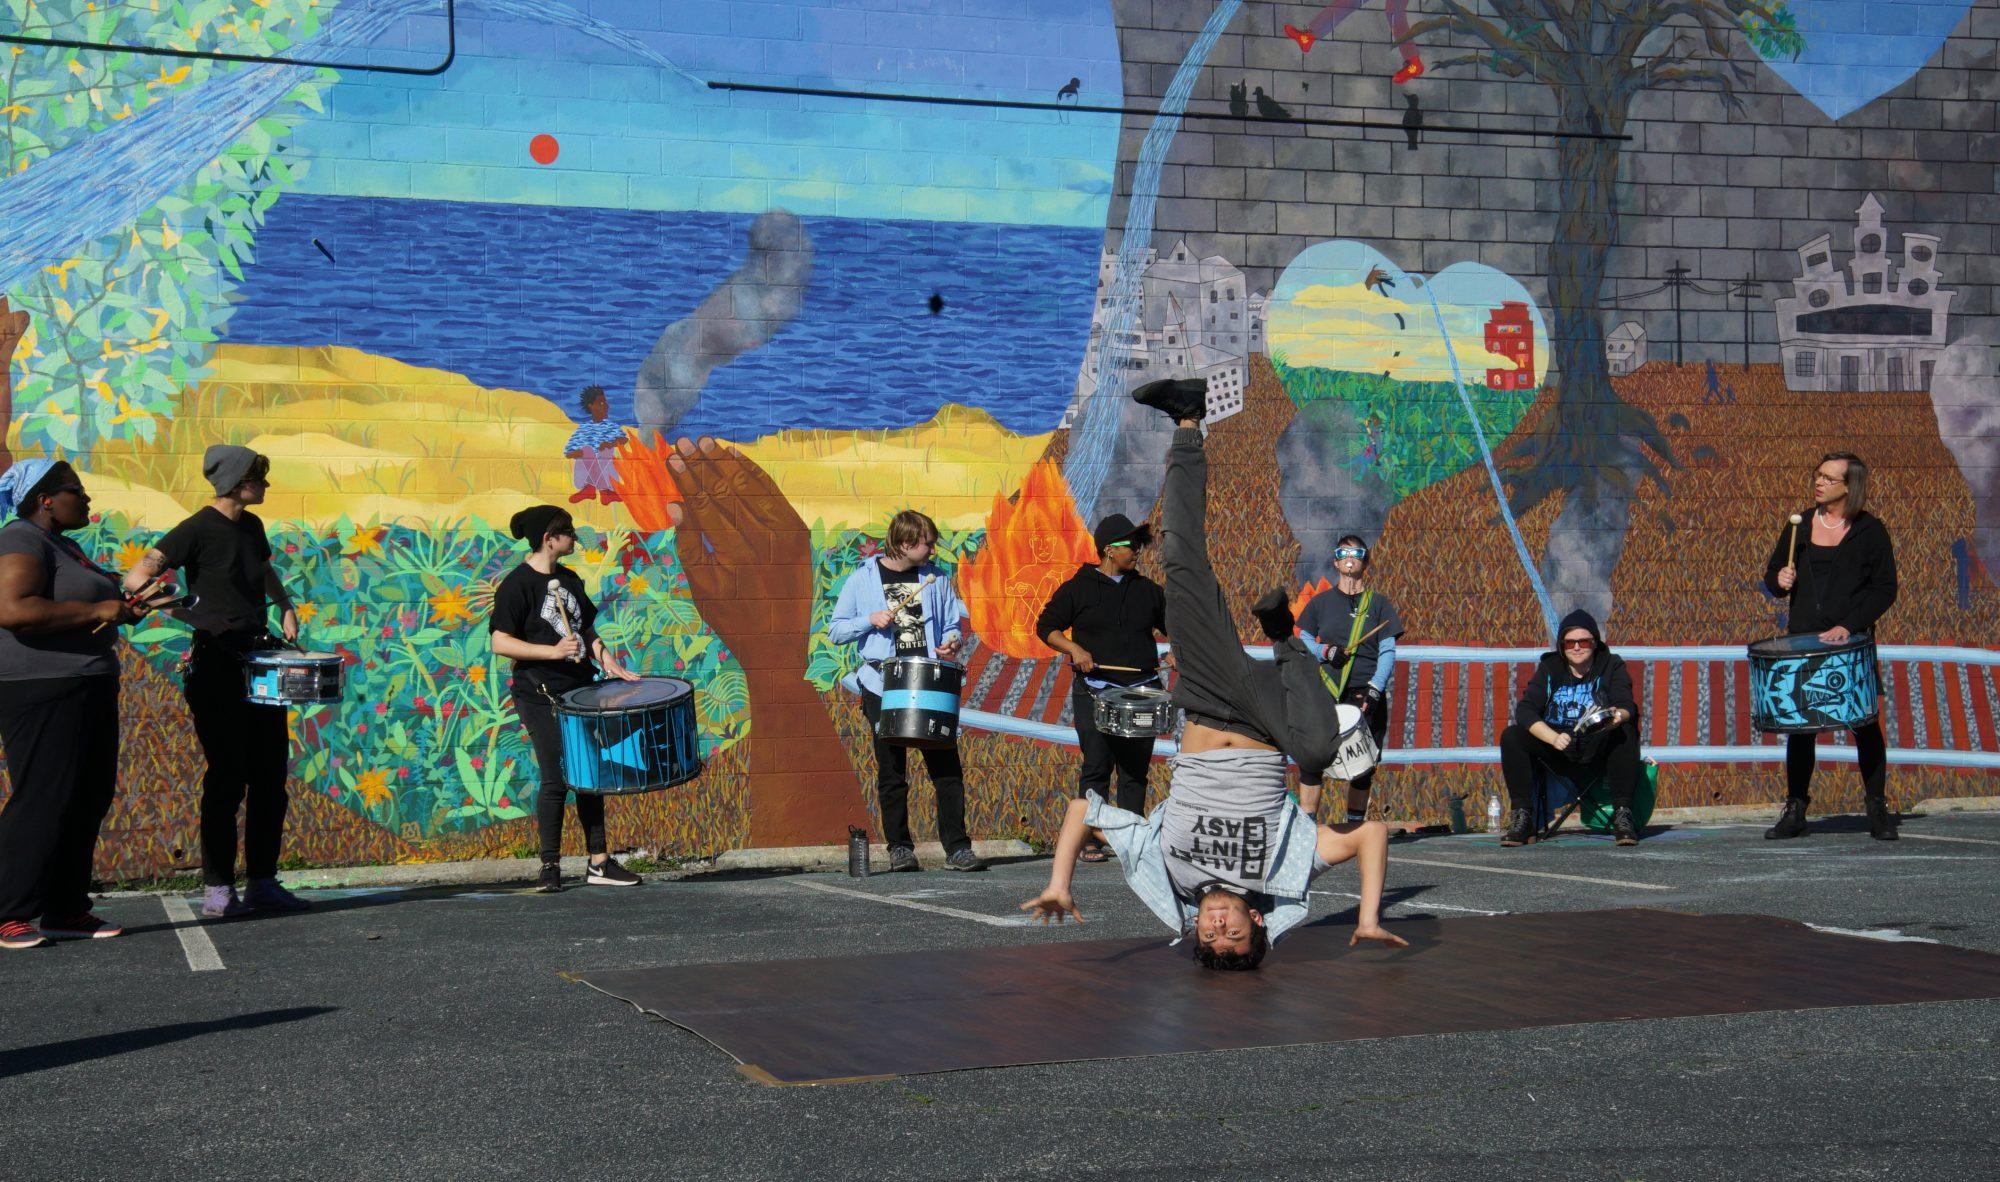 The Greensboro Mural Project